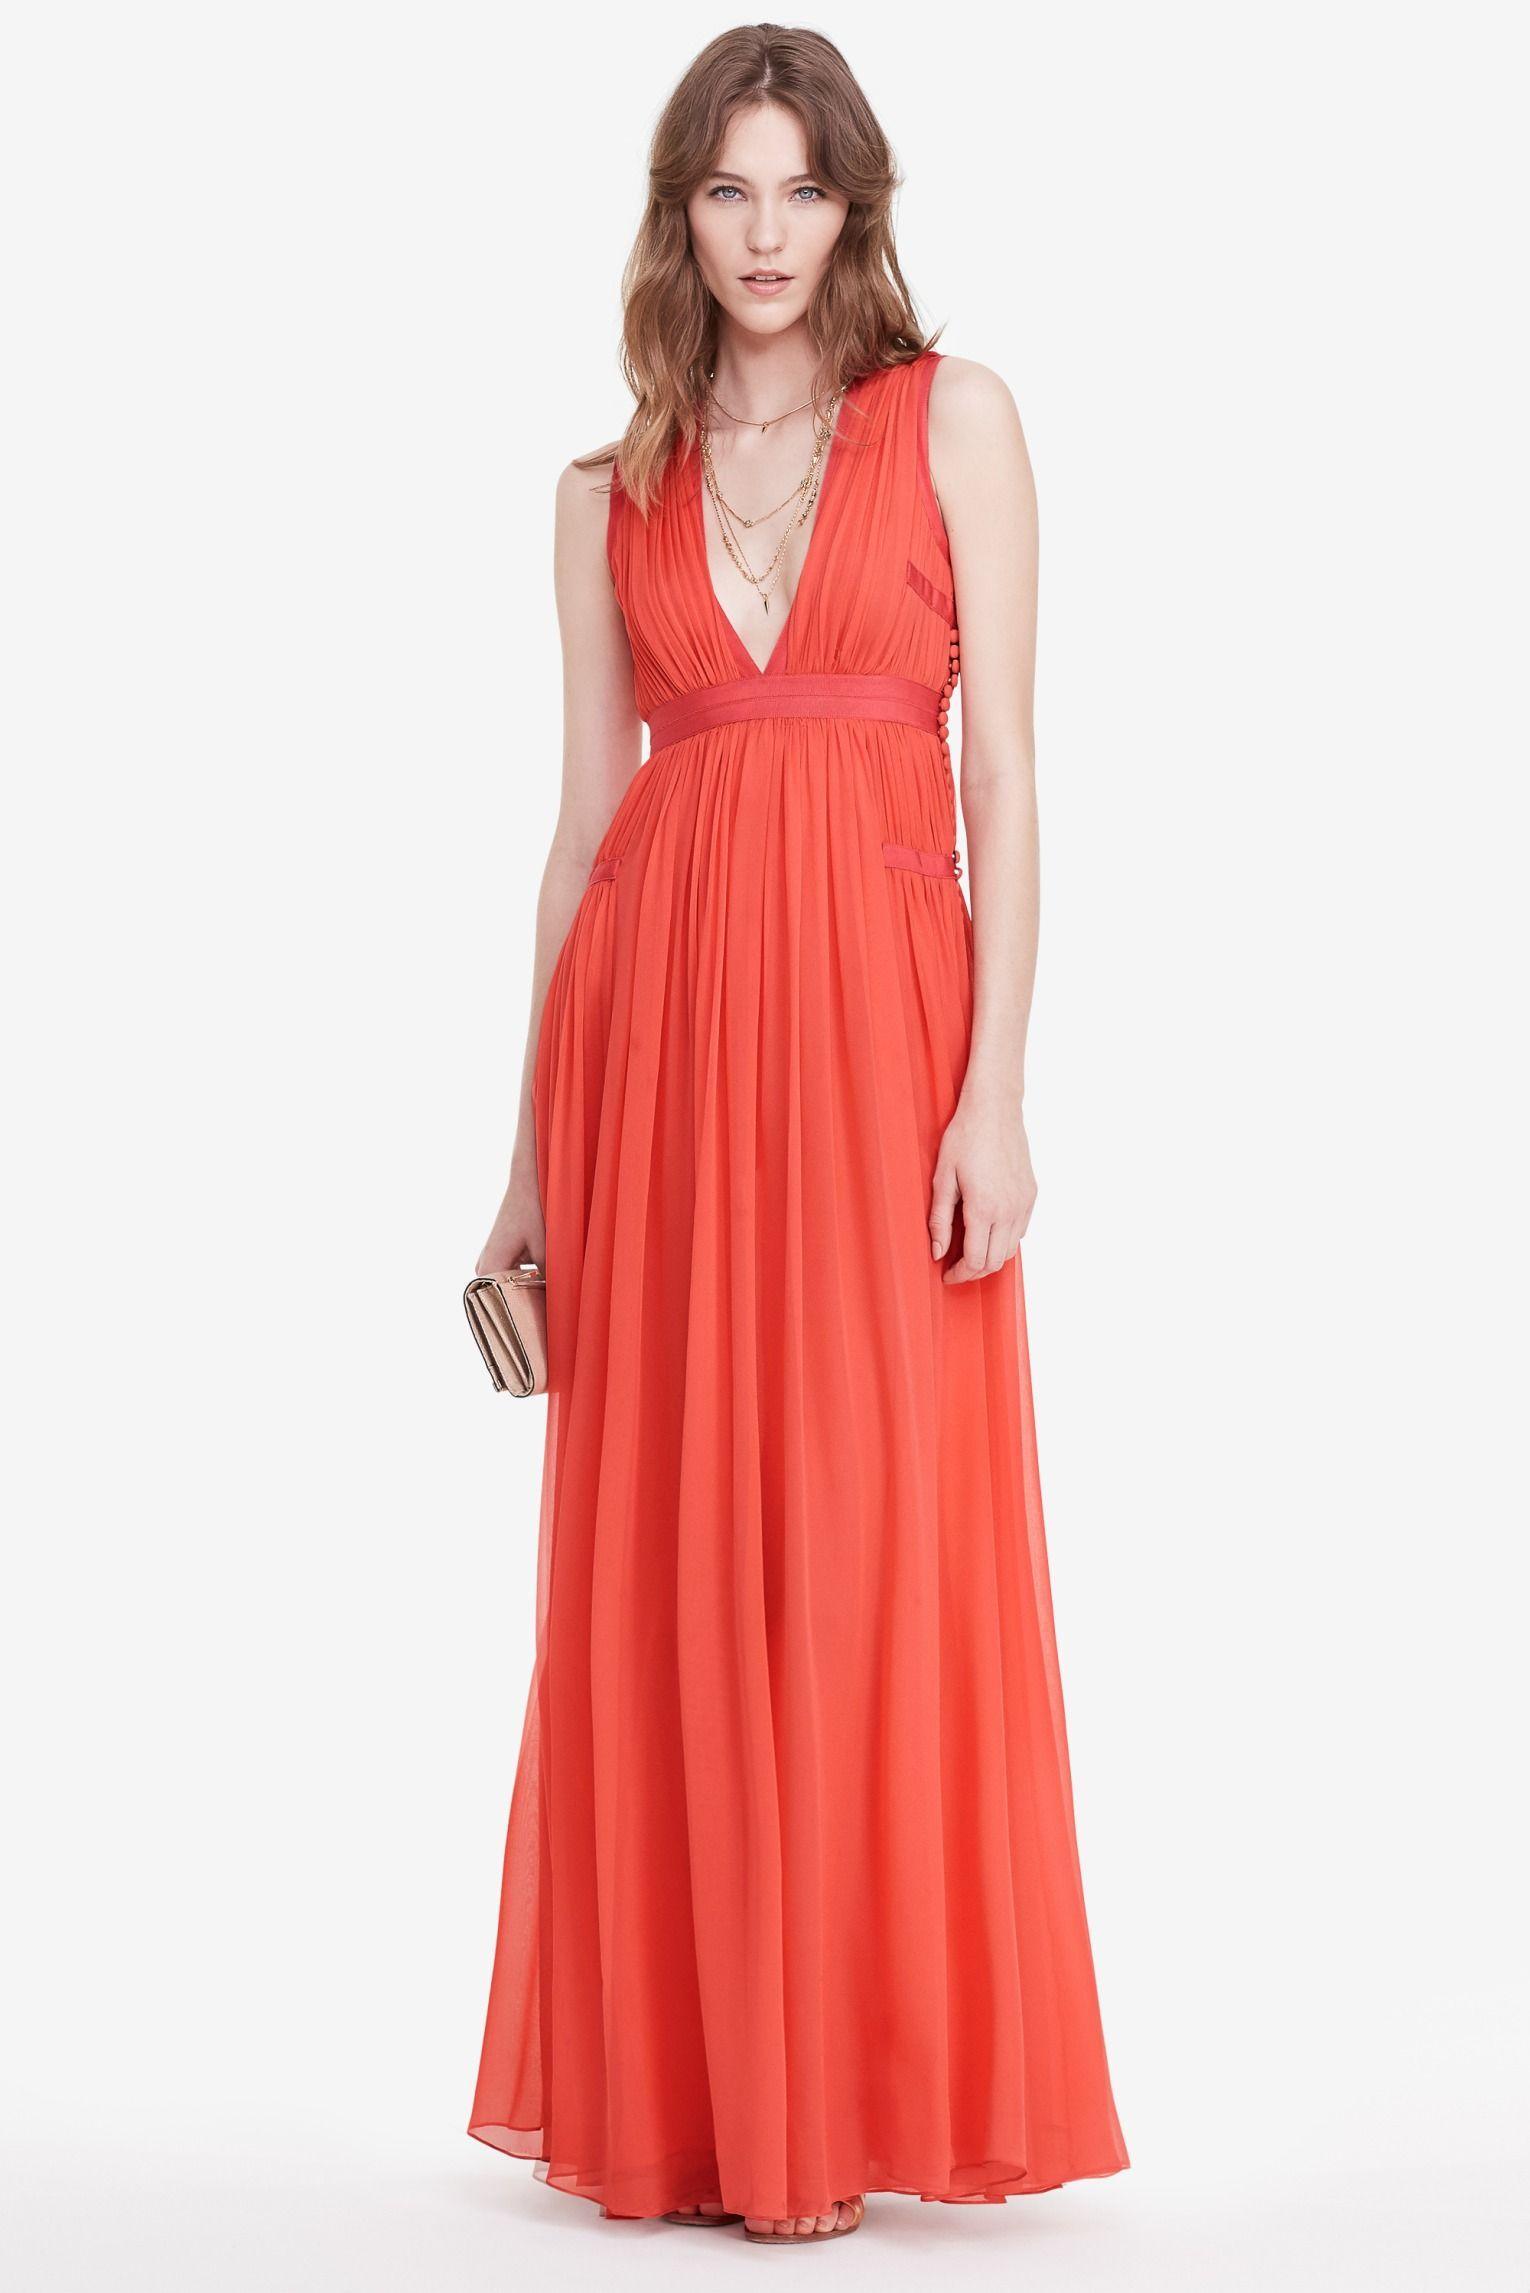 Dvf lelani pleated gown estilo pinterest gowns goddesses and